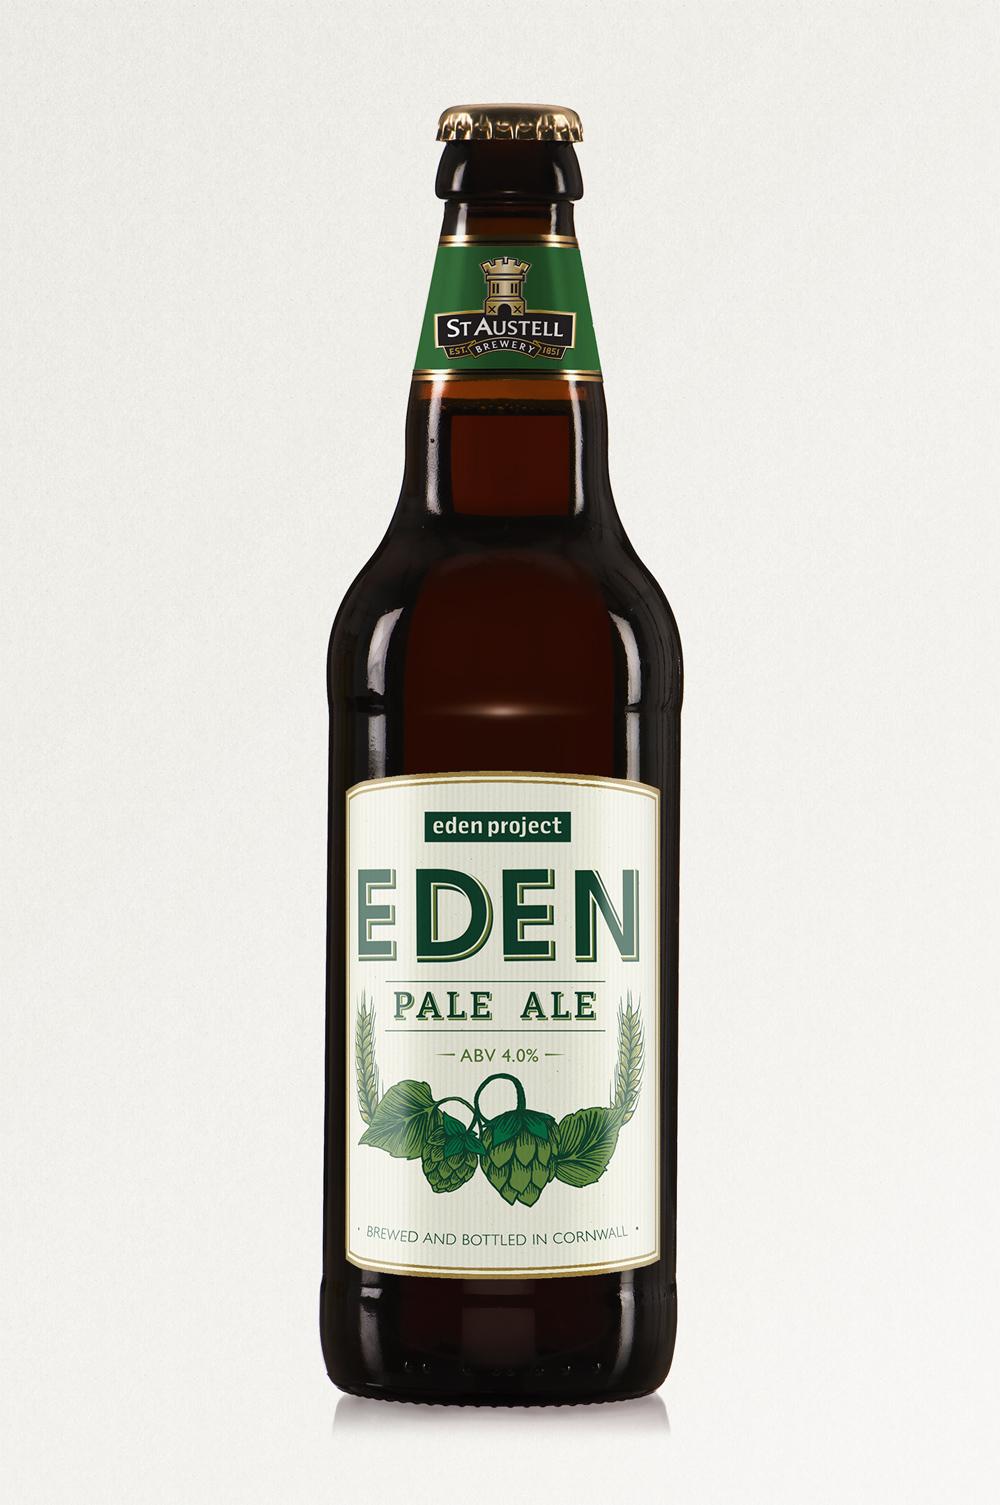 Eden Beer, St Austell Brewery, pale ale, bottle label design